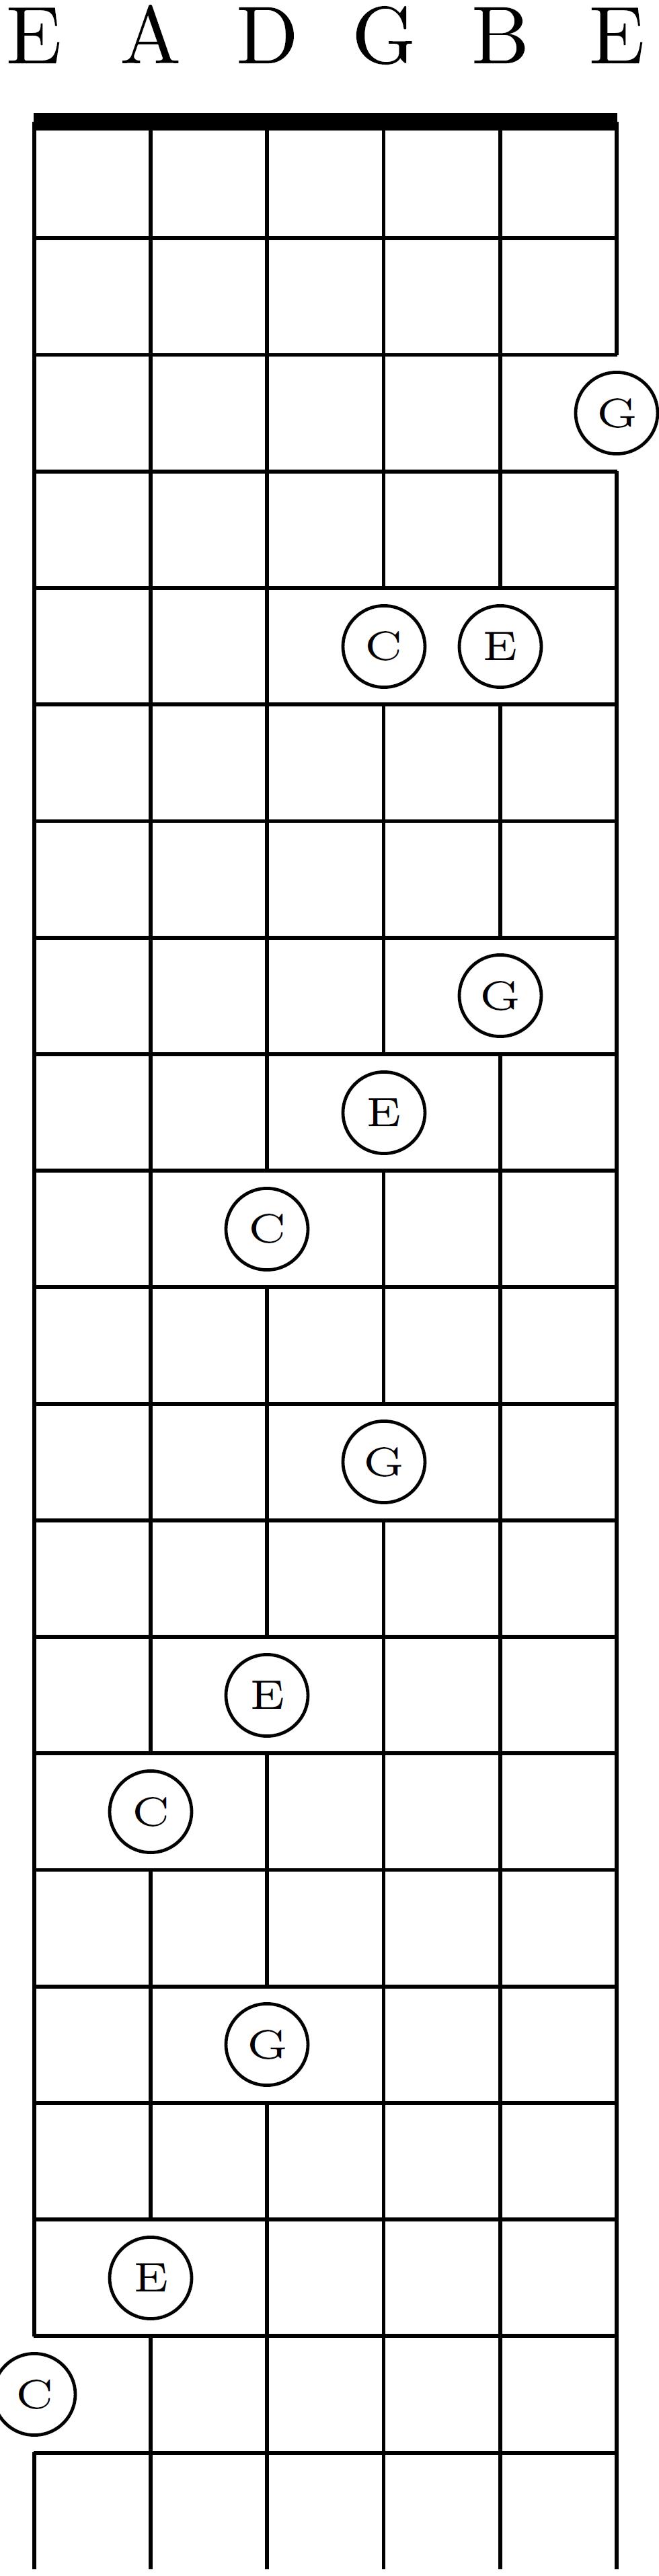 B Minor Guitar Chord Standard Tuning ecards makerarne duncan